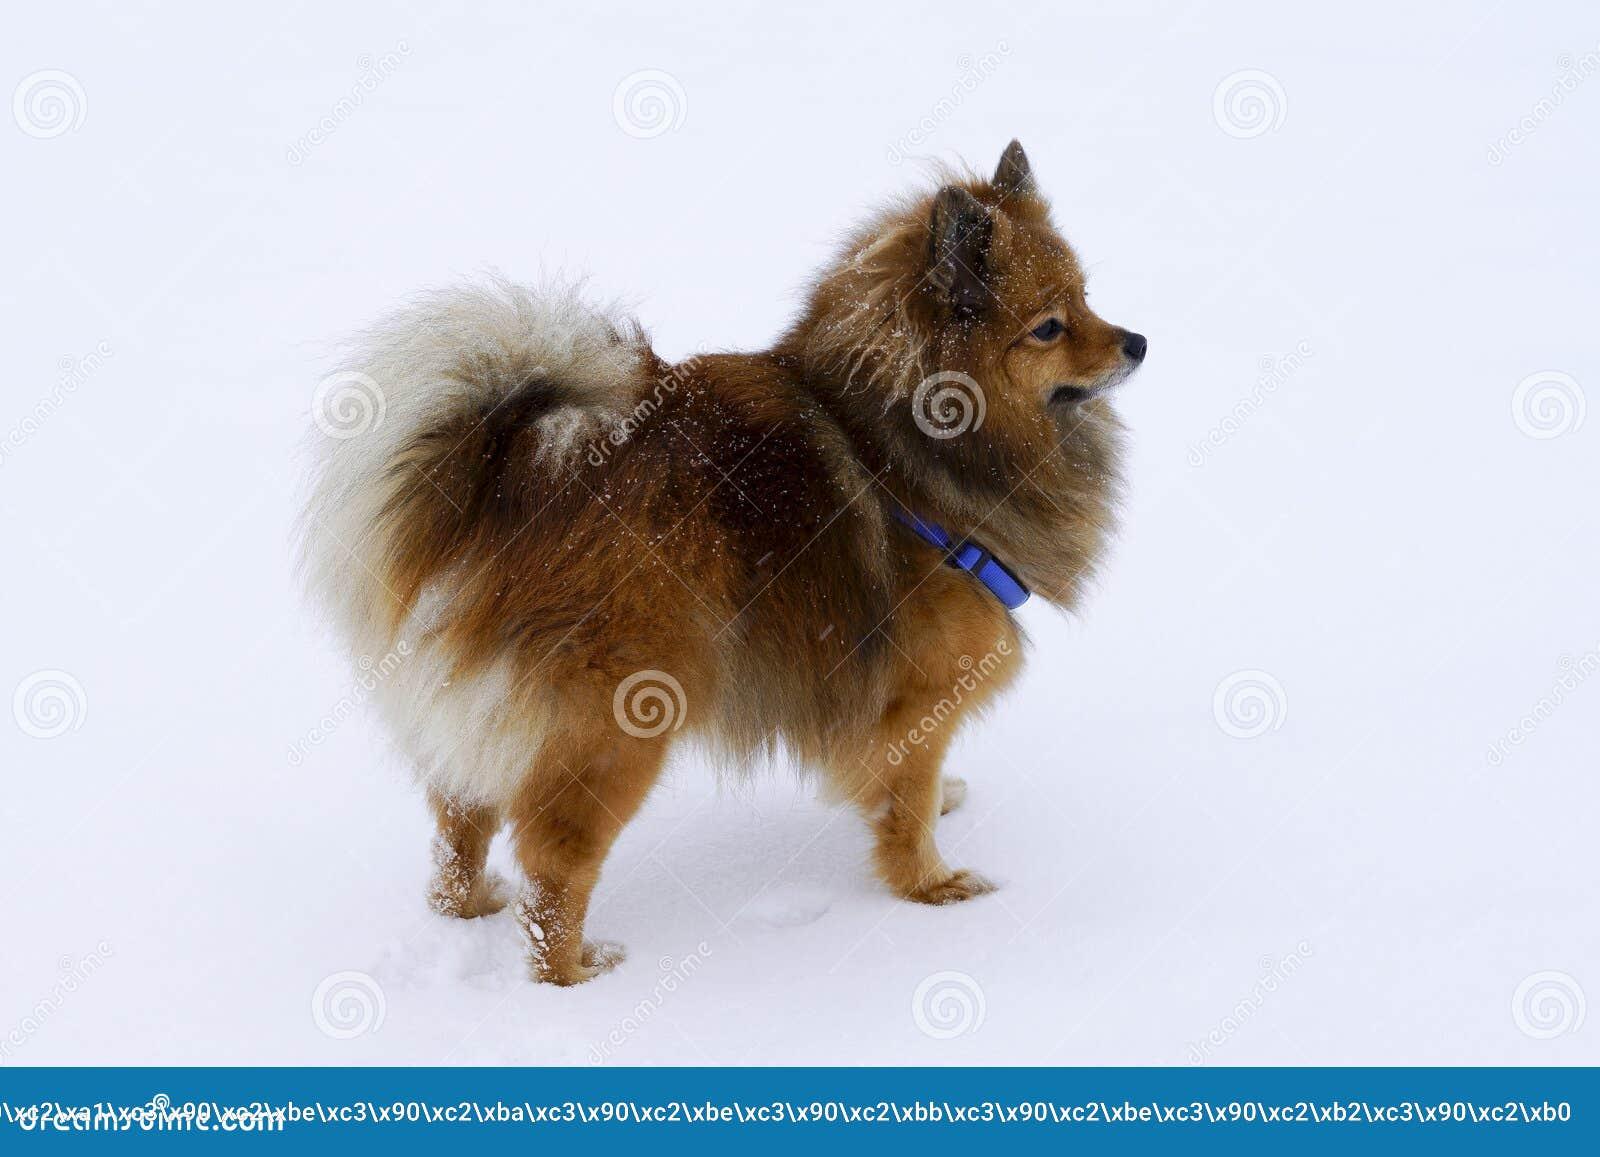 Dog portrait Spitz breed in winter on white background